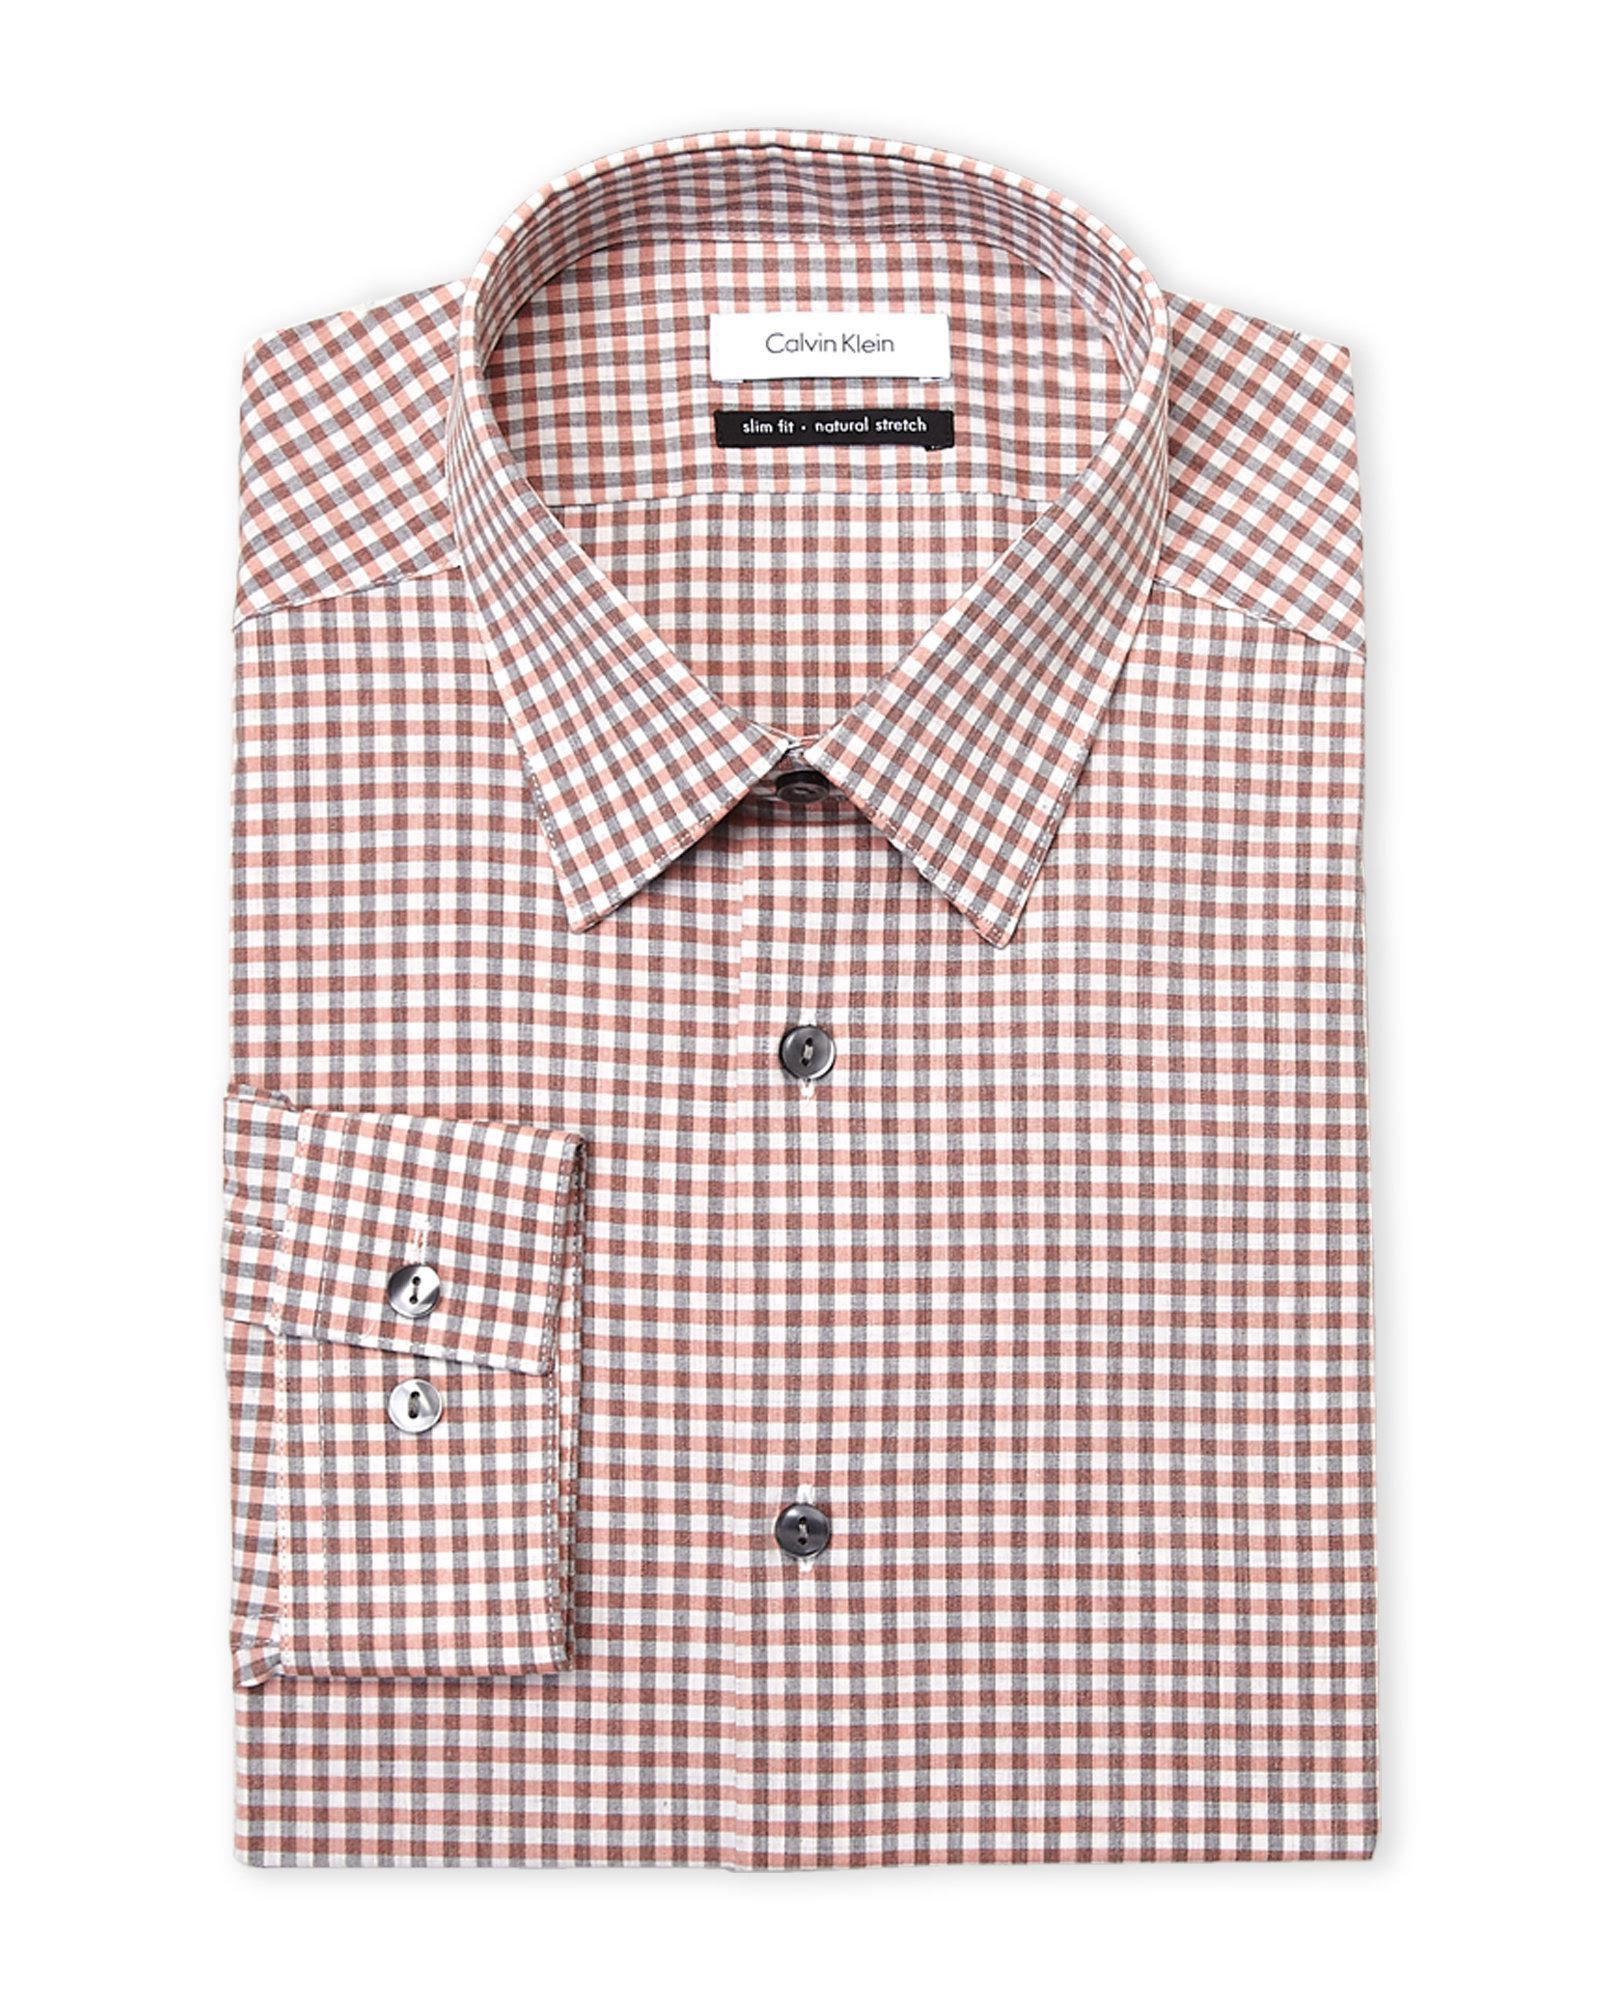 Lyst Calvin Klein Salmon Plaid Slim Fit Dress Shirt In Red For Men